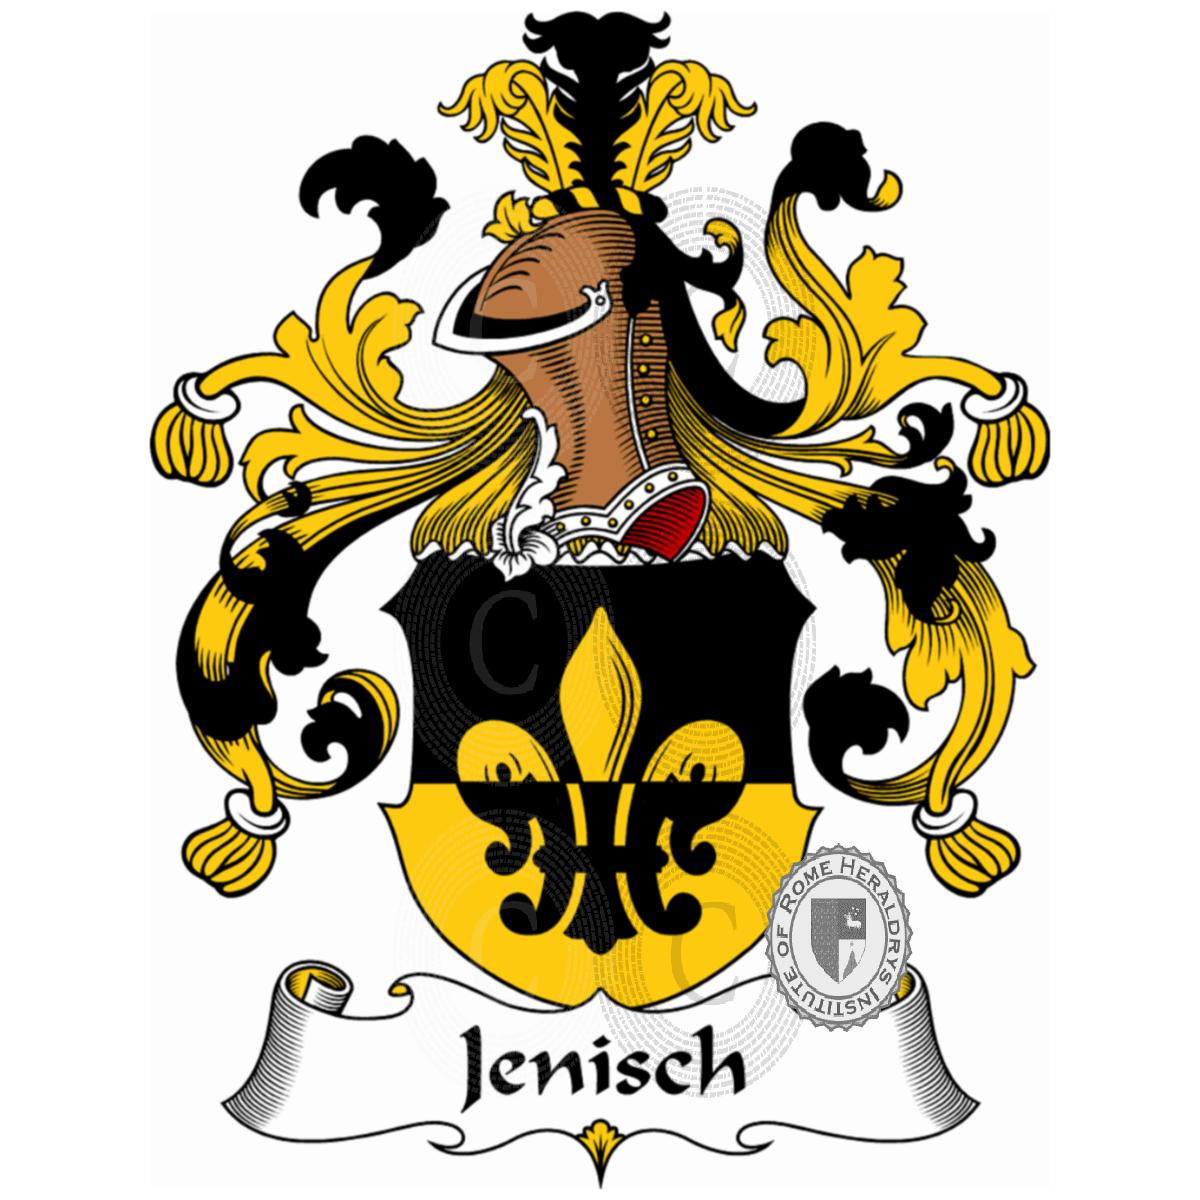 jenisch deutsch